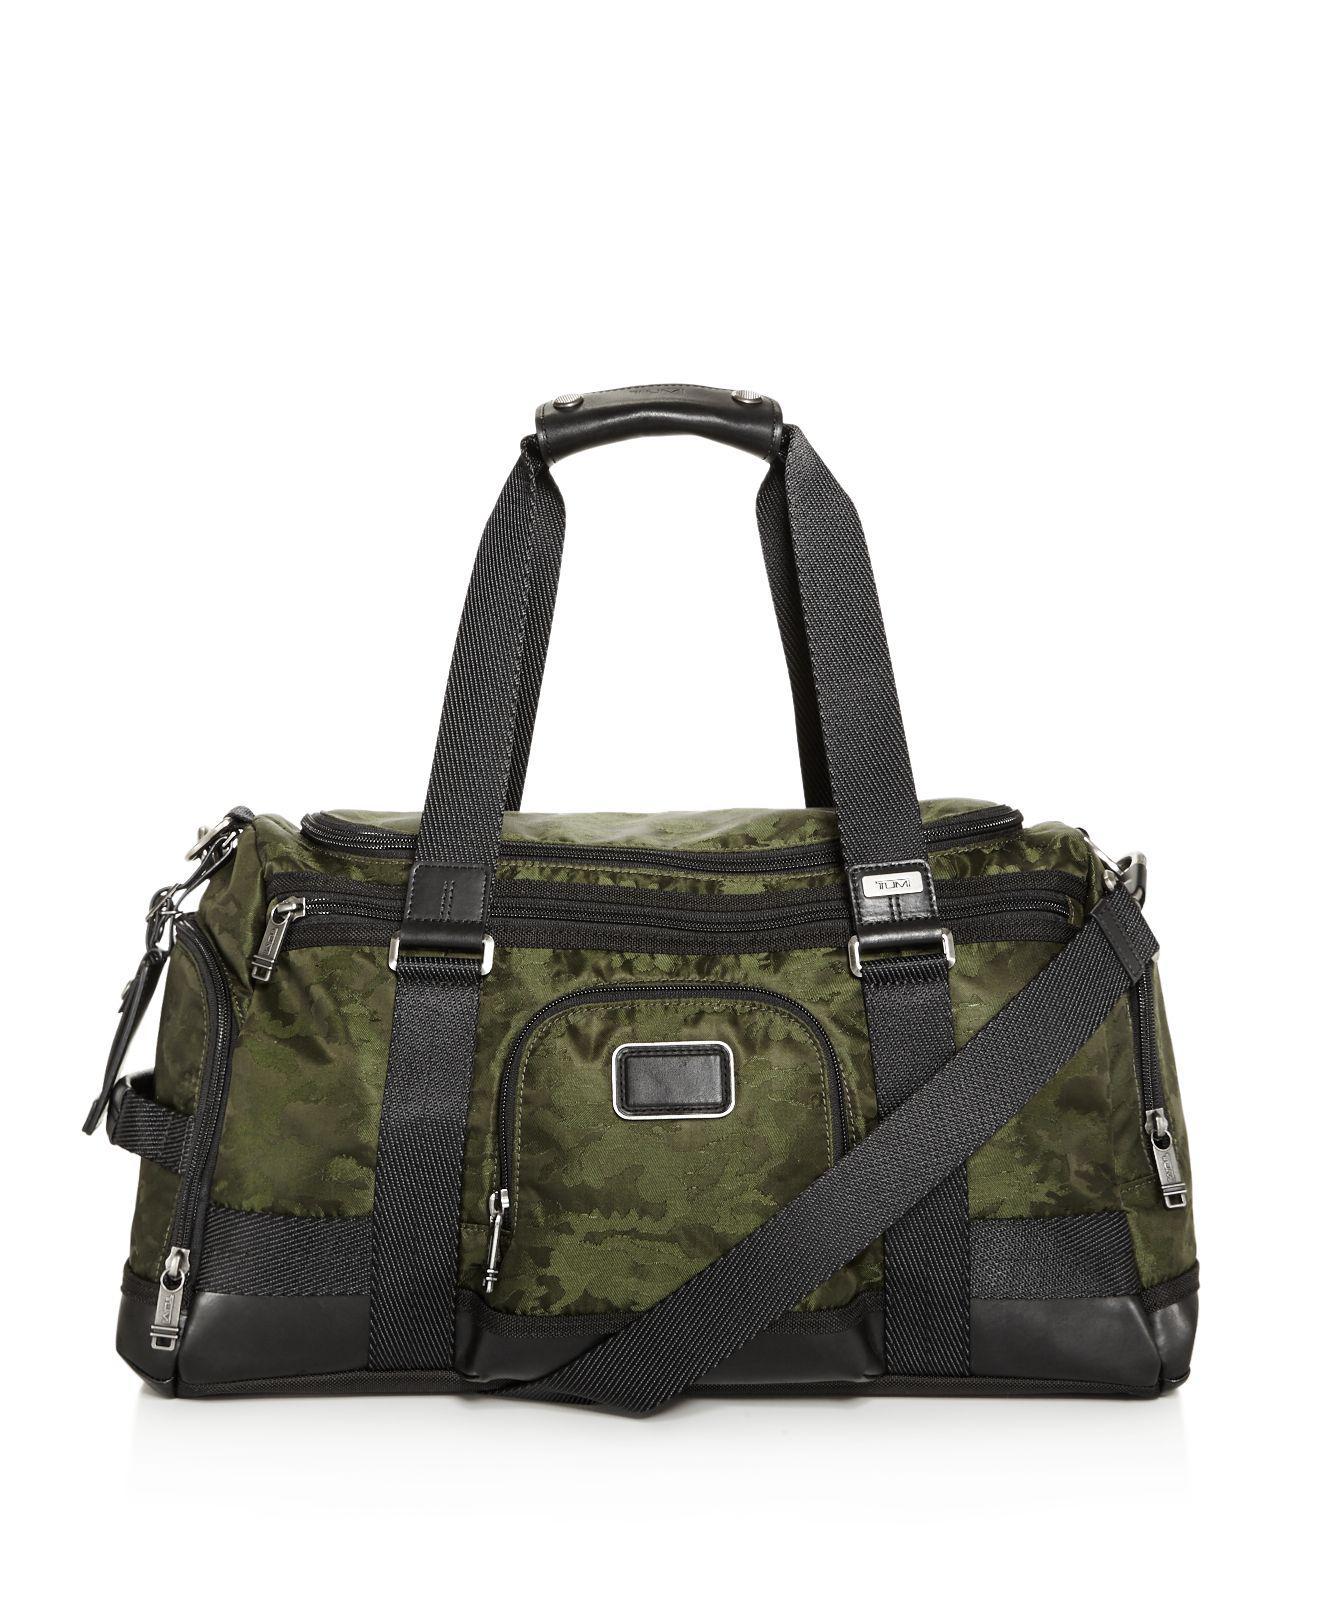 Tumi Camo Maxwell Duffel Bag in Green for Men - Lyst